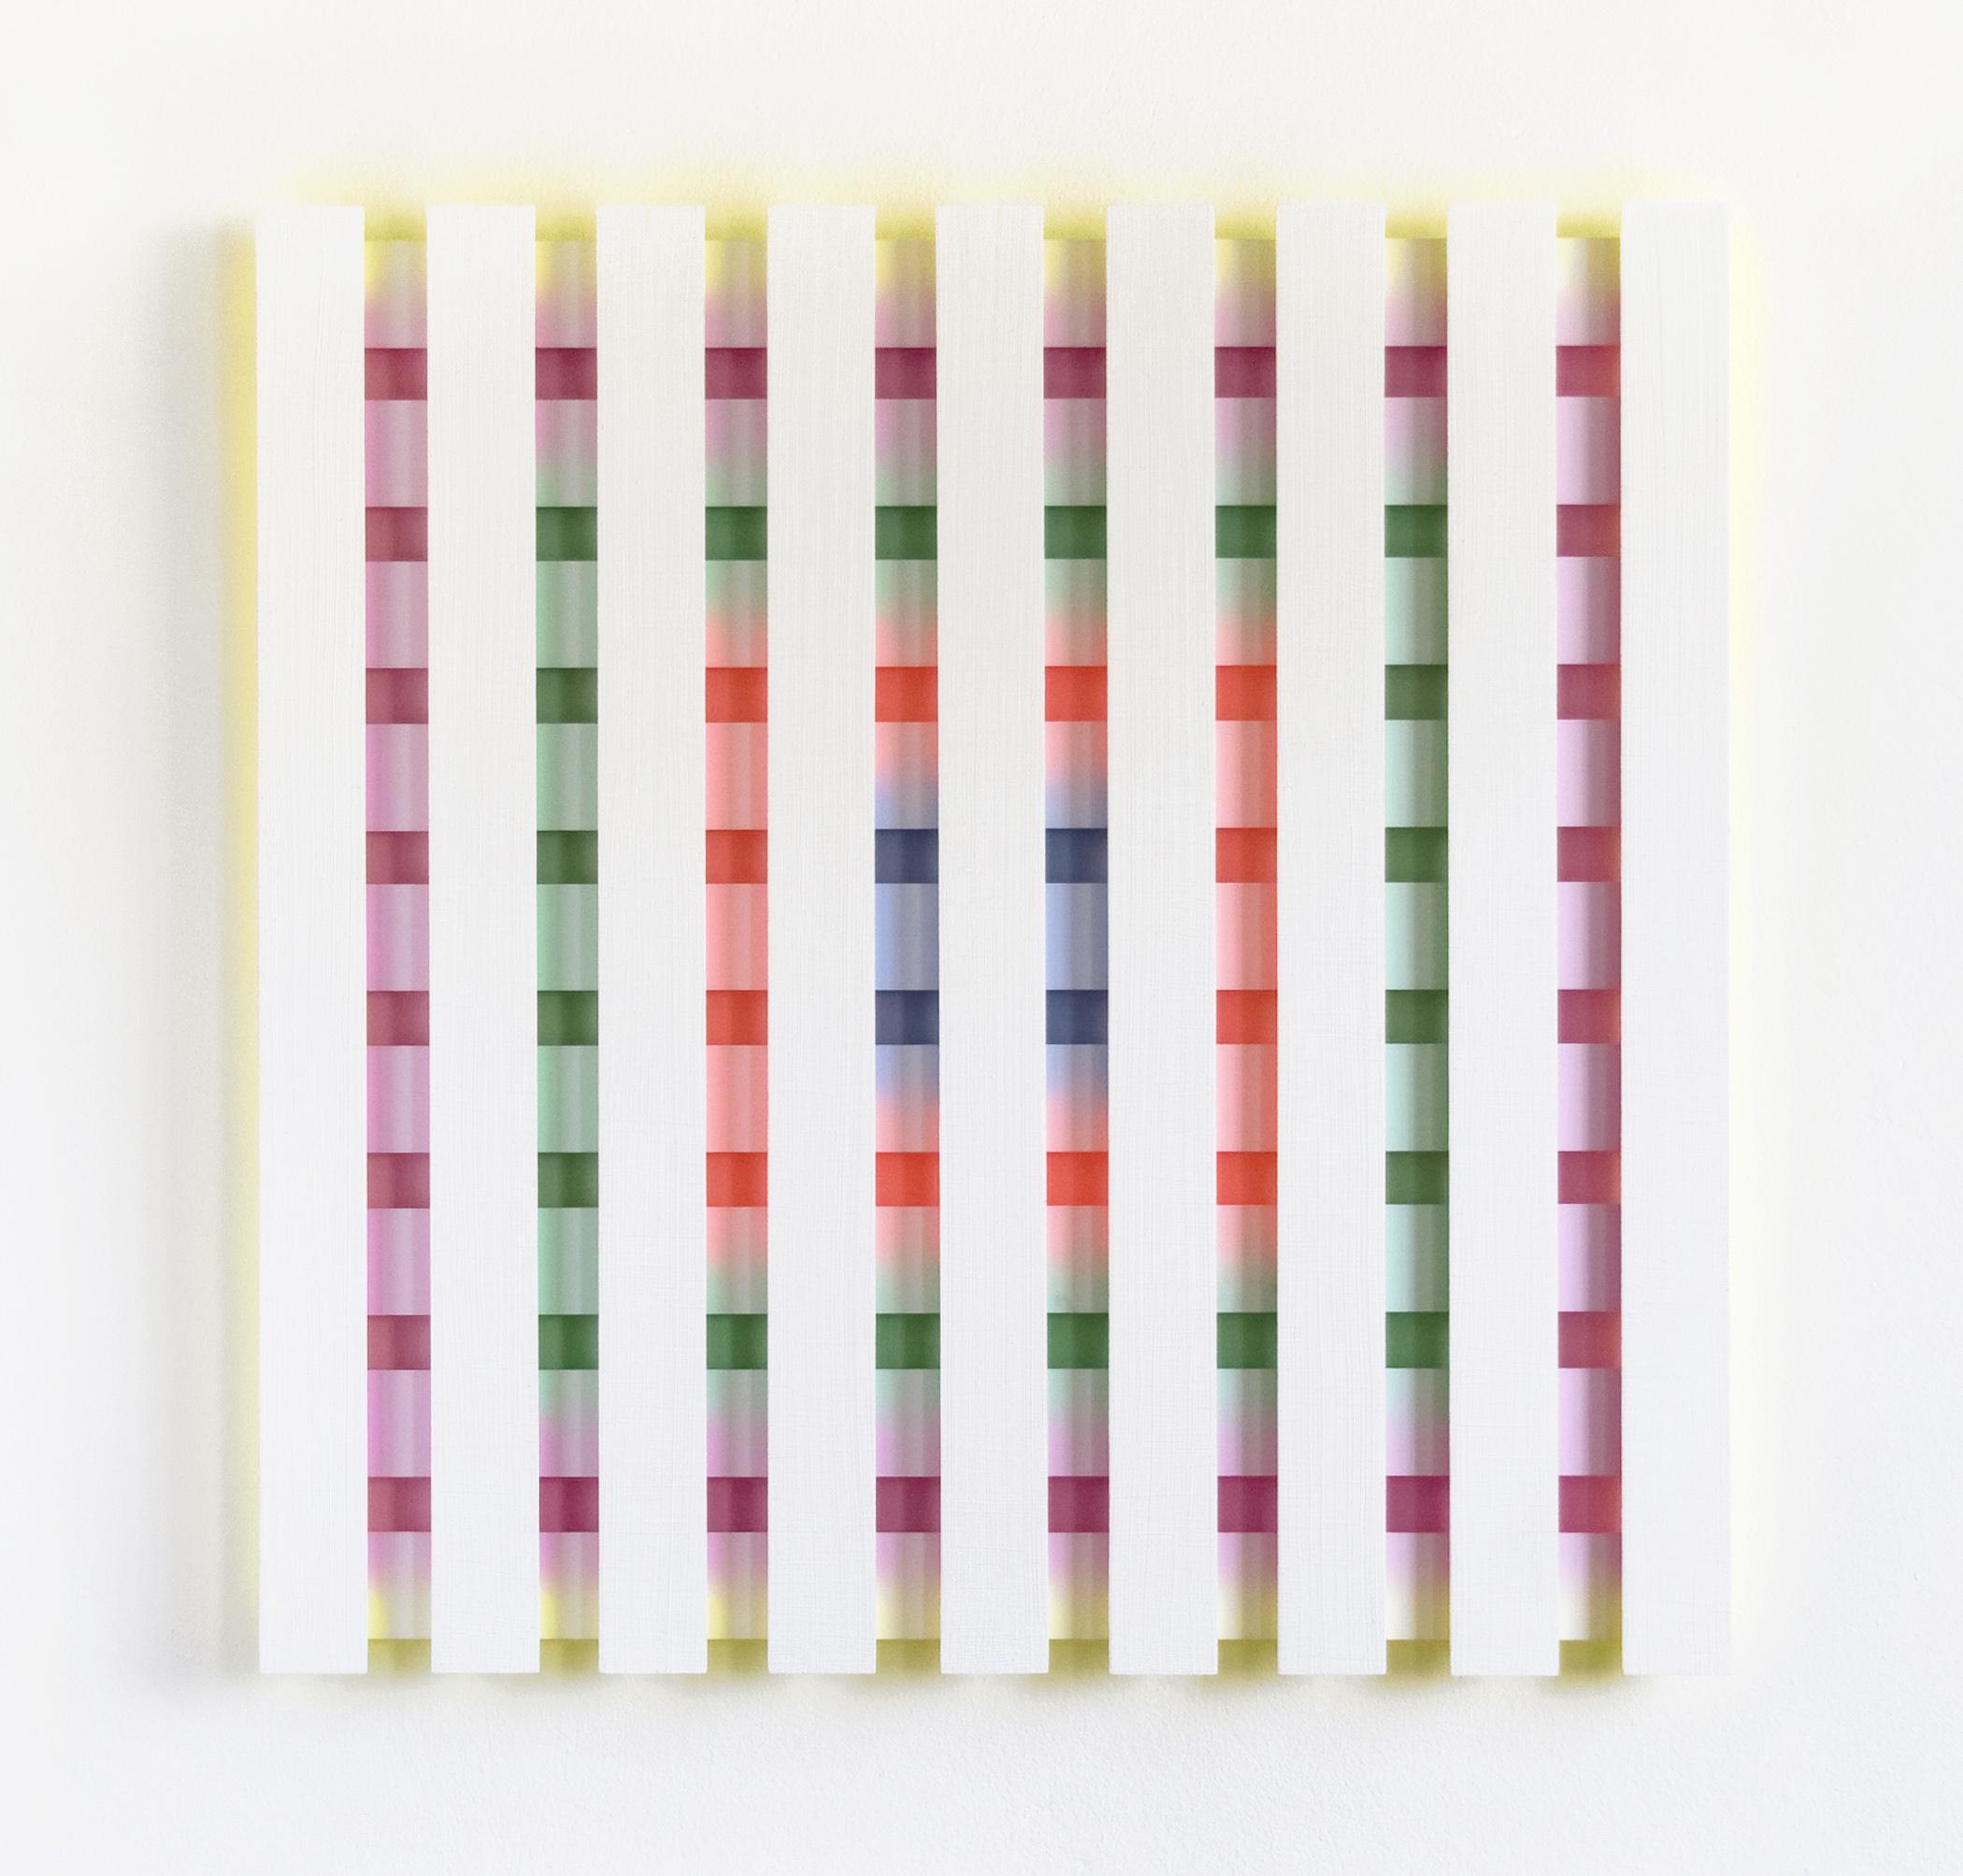 1k akril, les, 121 x 121 cm, 2008.jpg